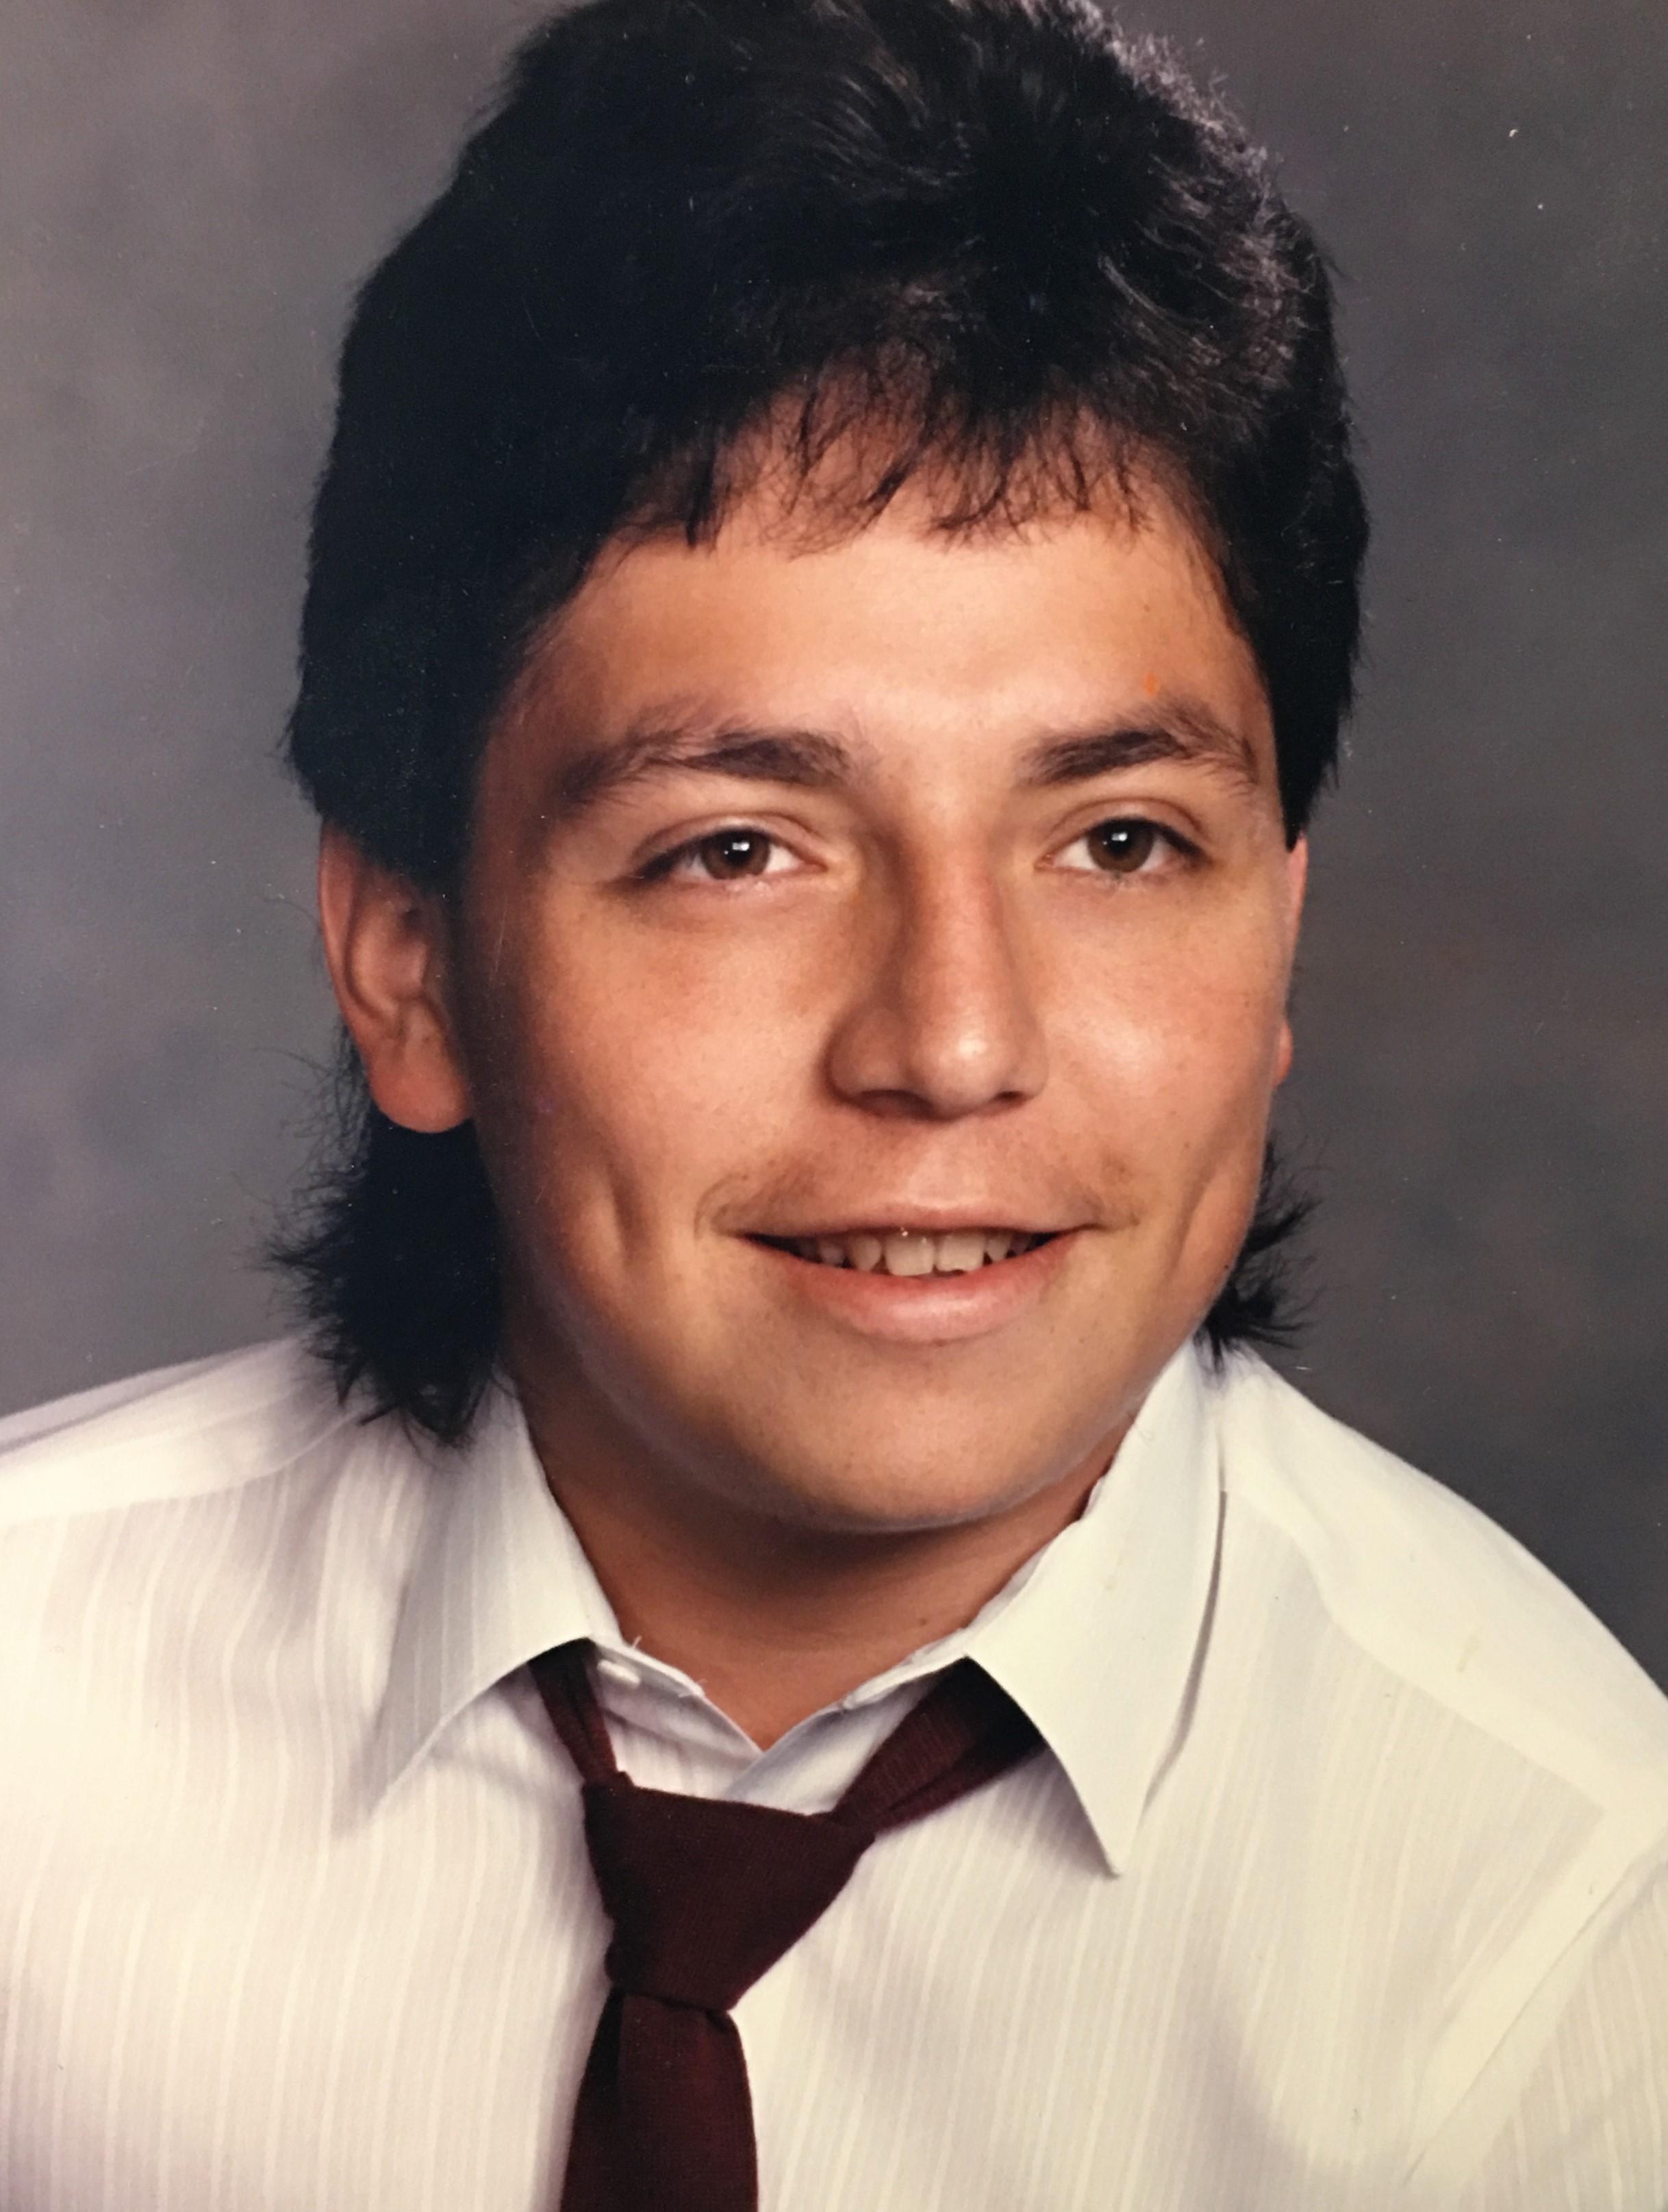 Steven Torres Castillo